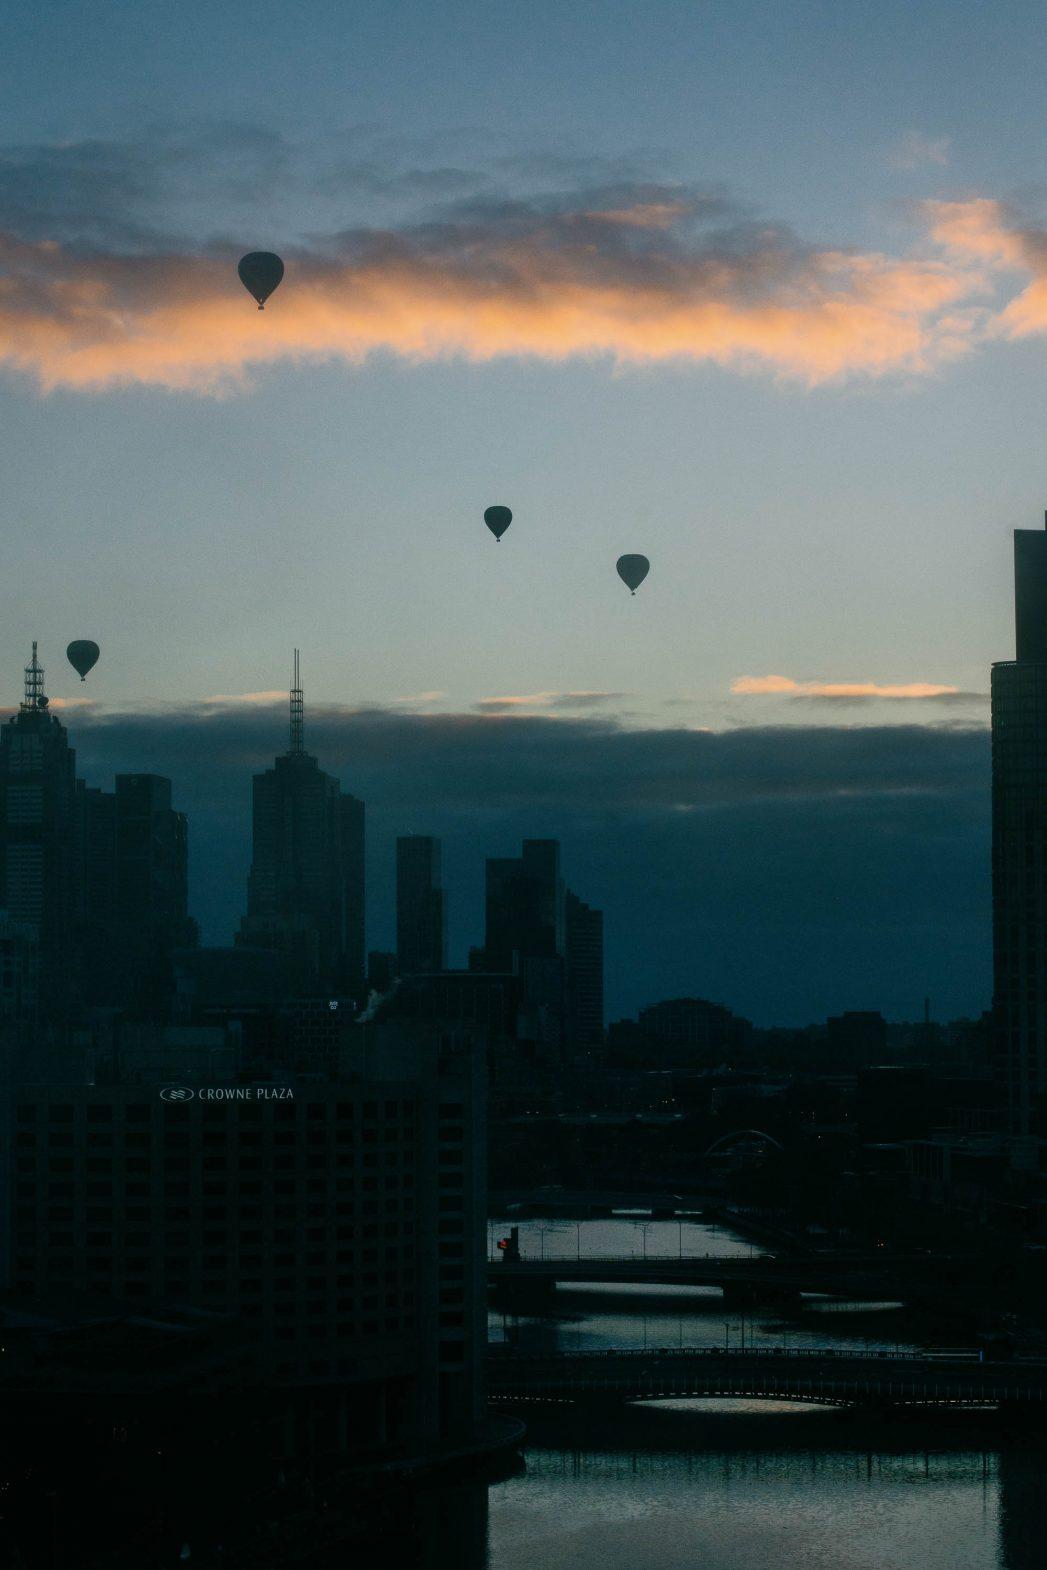 hot air balloons over the city skyline.